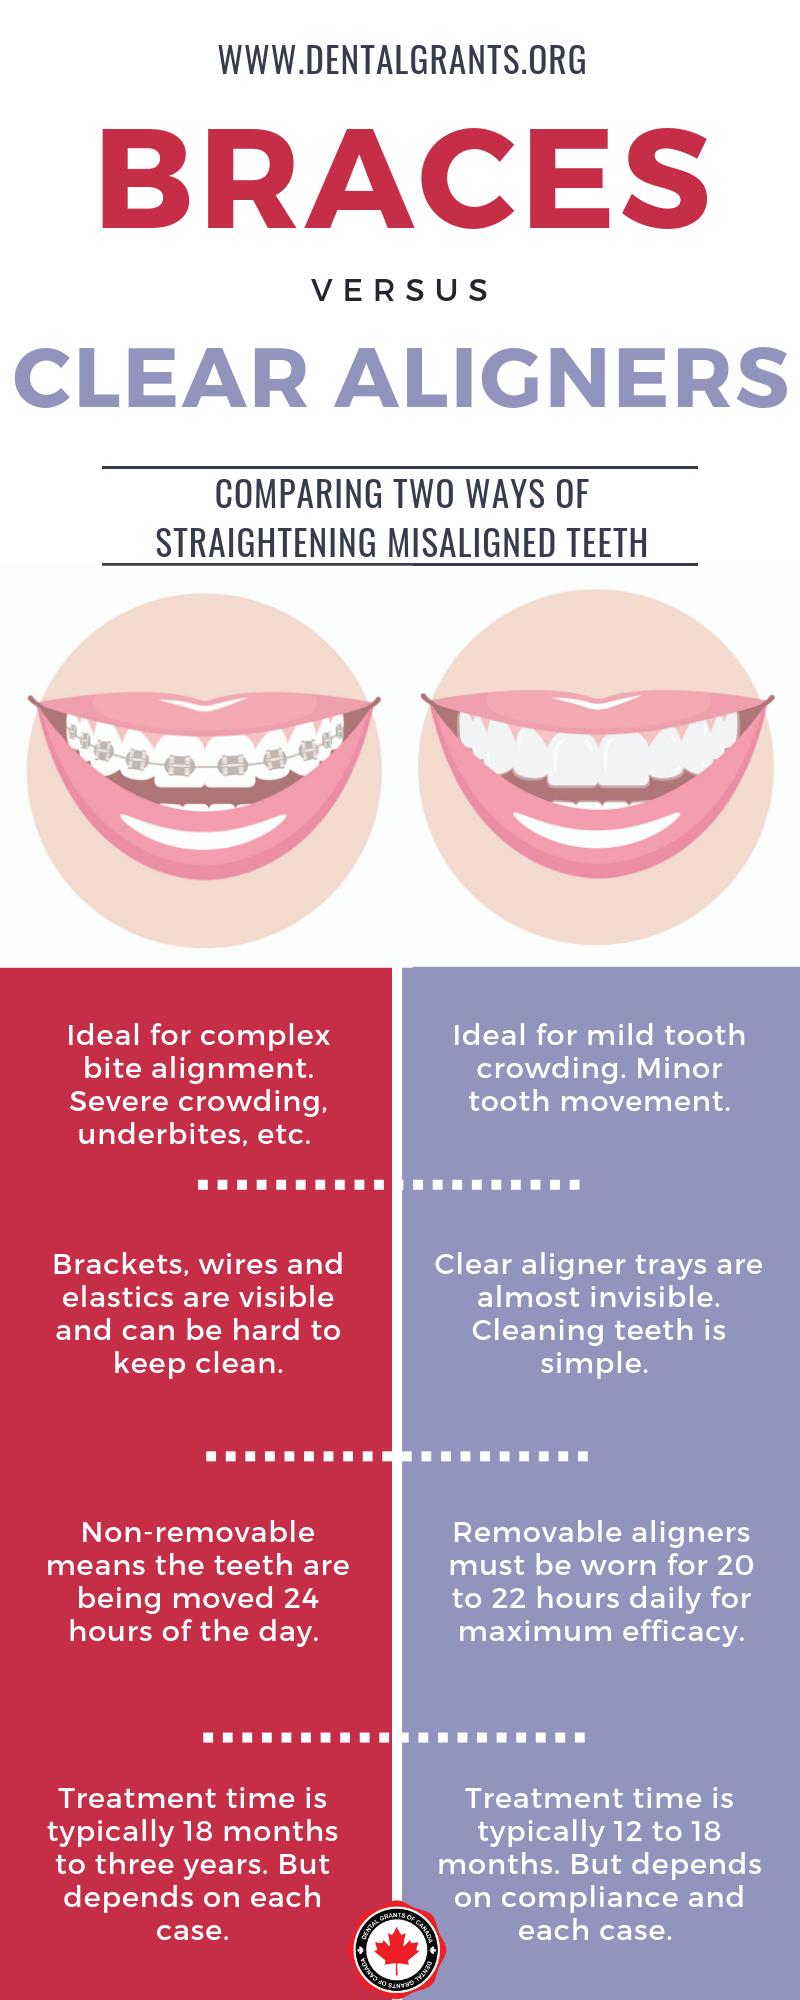 braces orthodontics versus vs clear aligners invisalign dentist orthodontics information